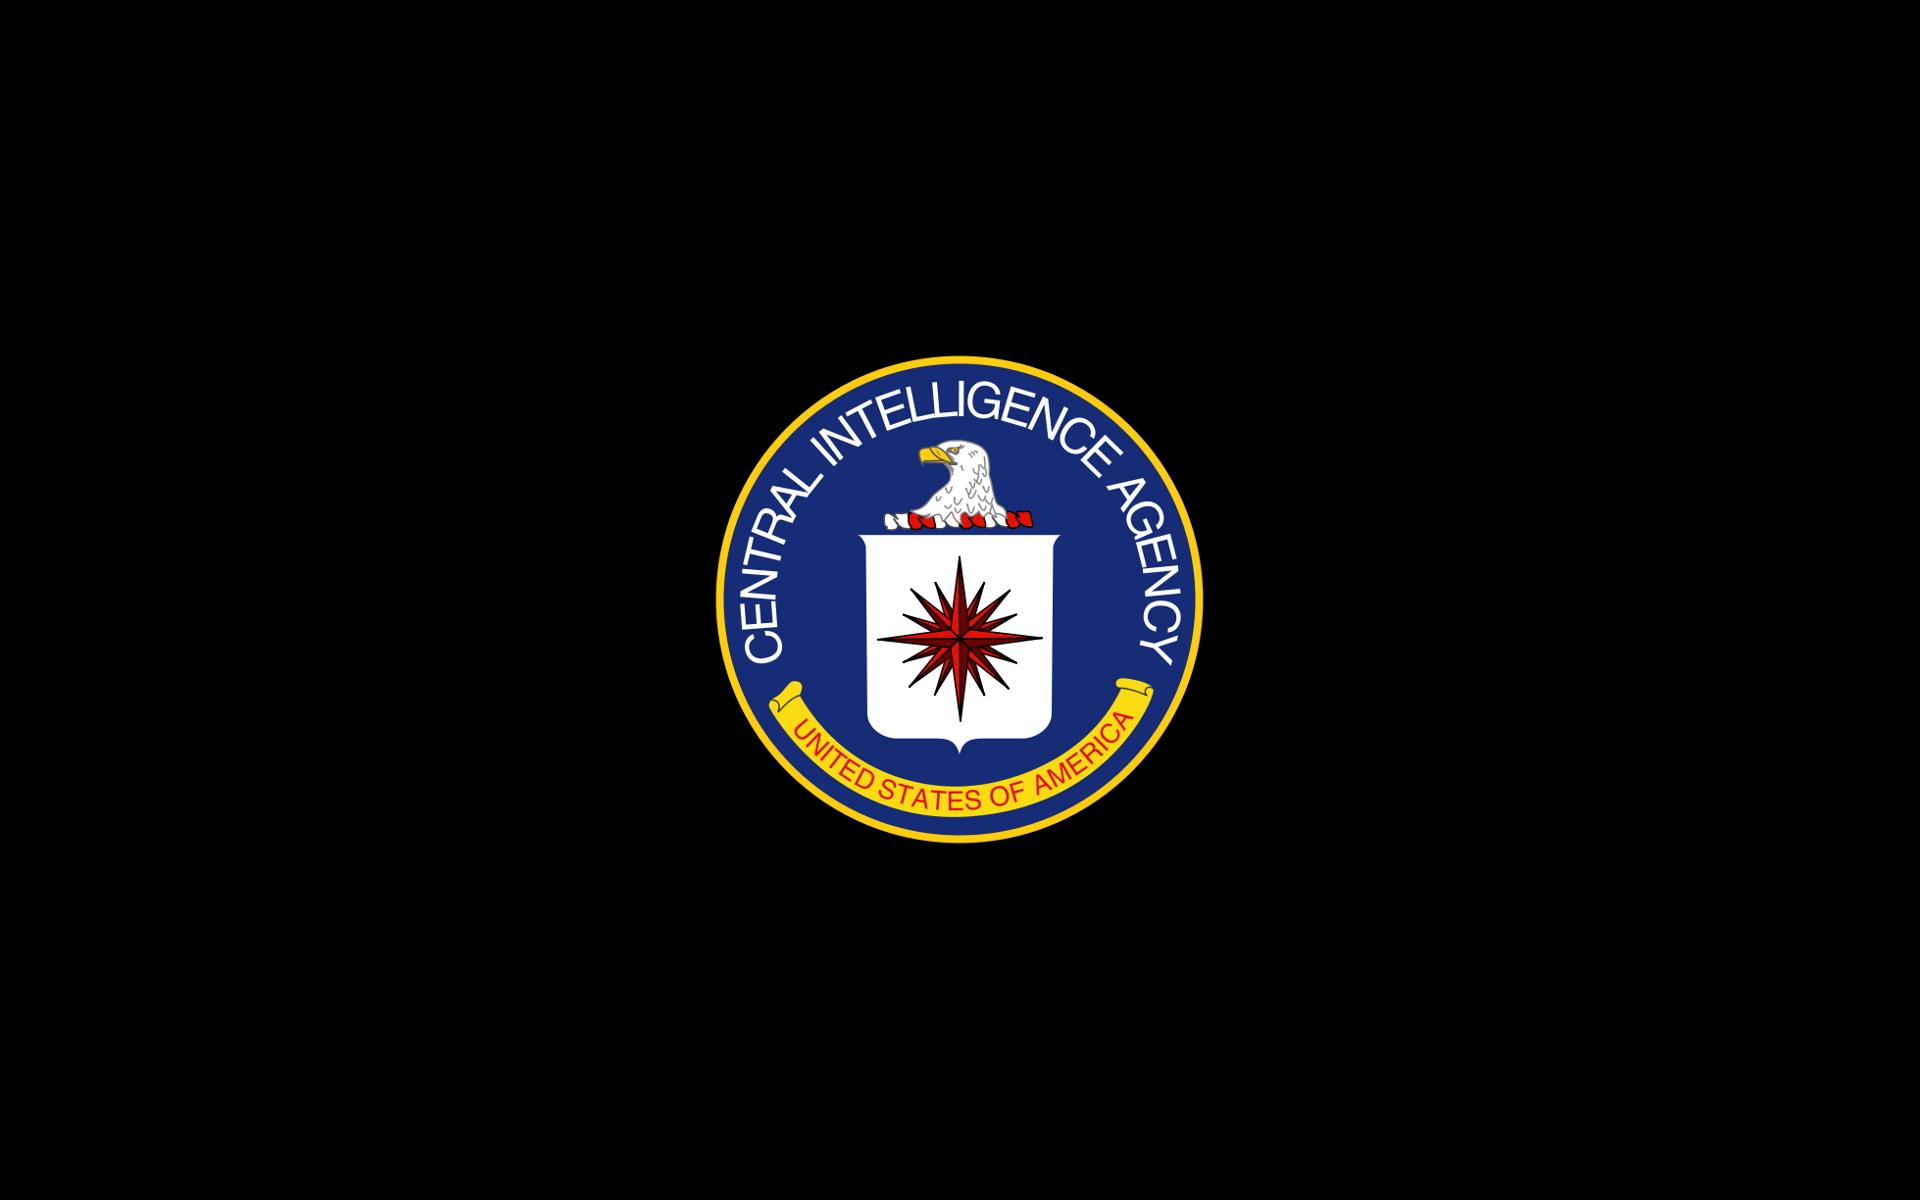 http://fc01.deviantart.net/fs43/f/2009/083/9/8/CIA_Logo_Black_by_gandiusz.jpg